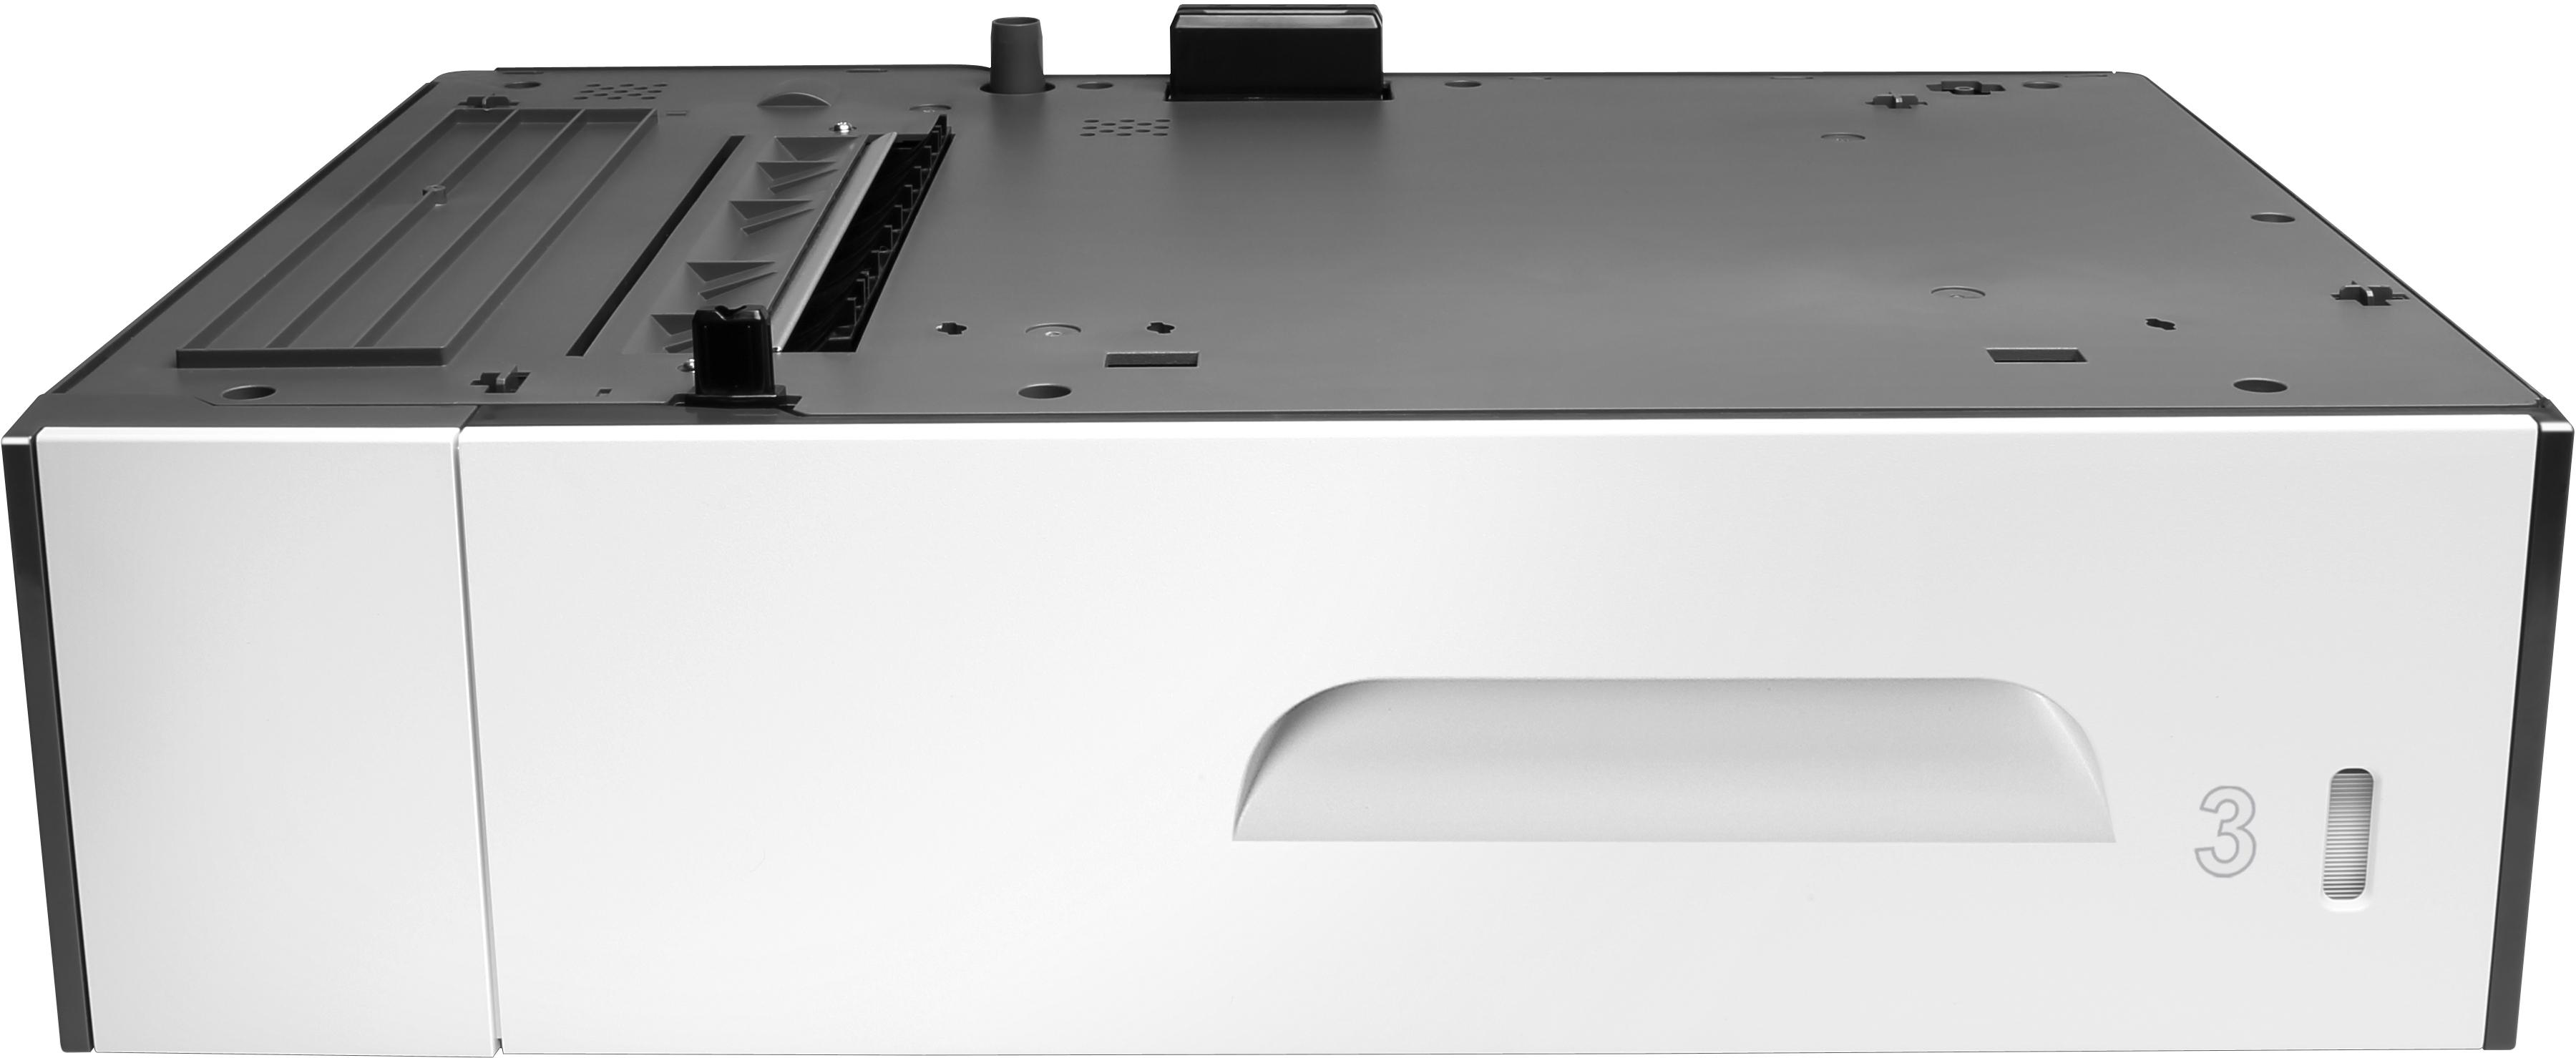 HP PageWide Enterprise 500-sheet Paper Tray